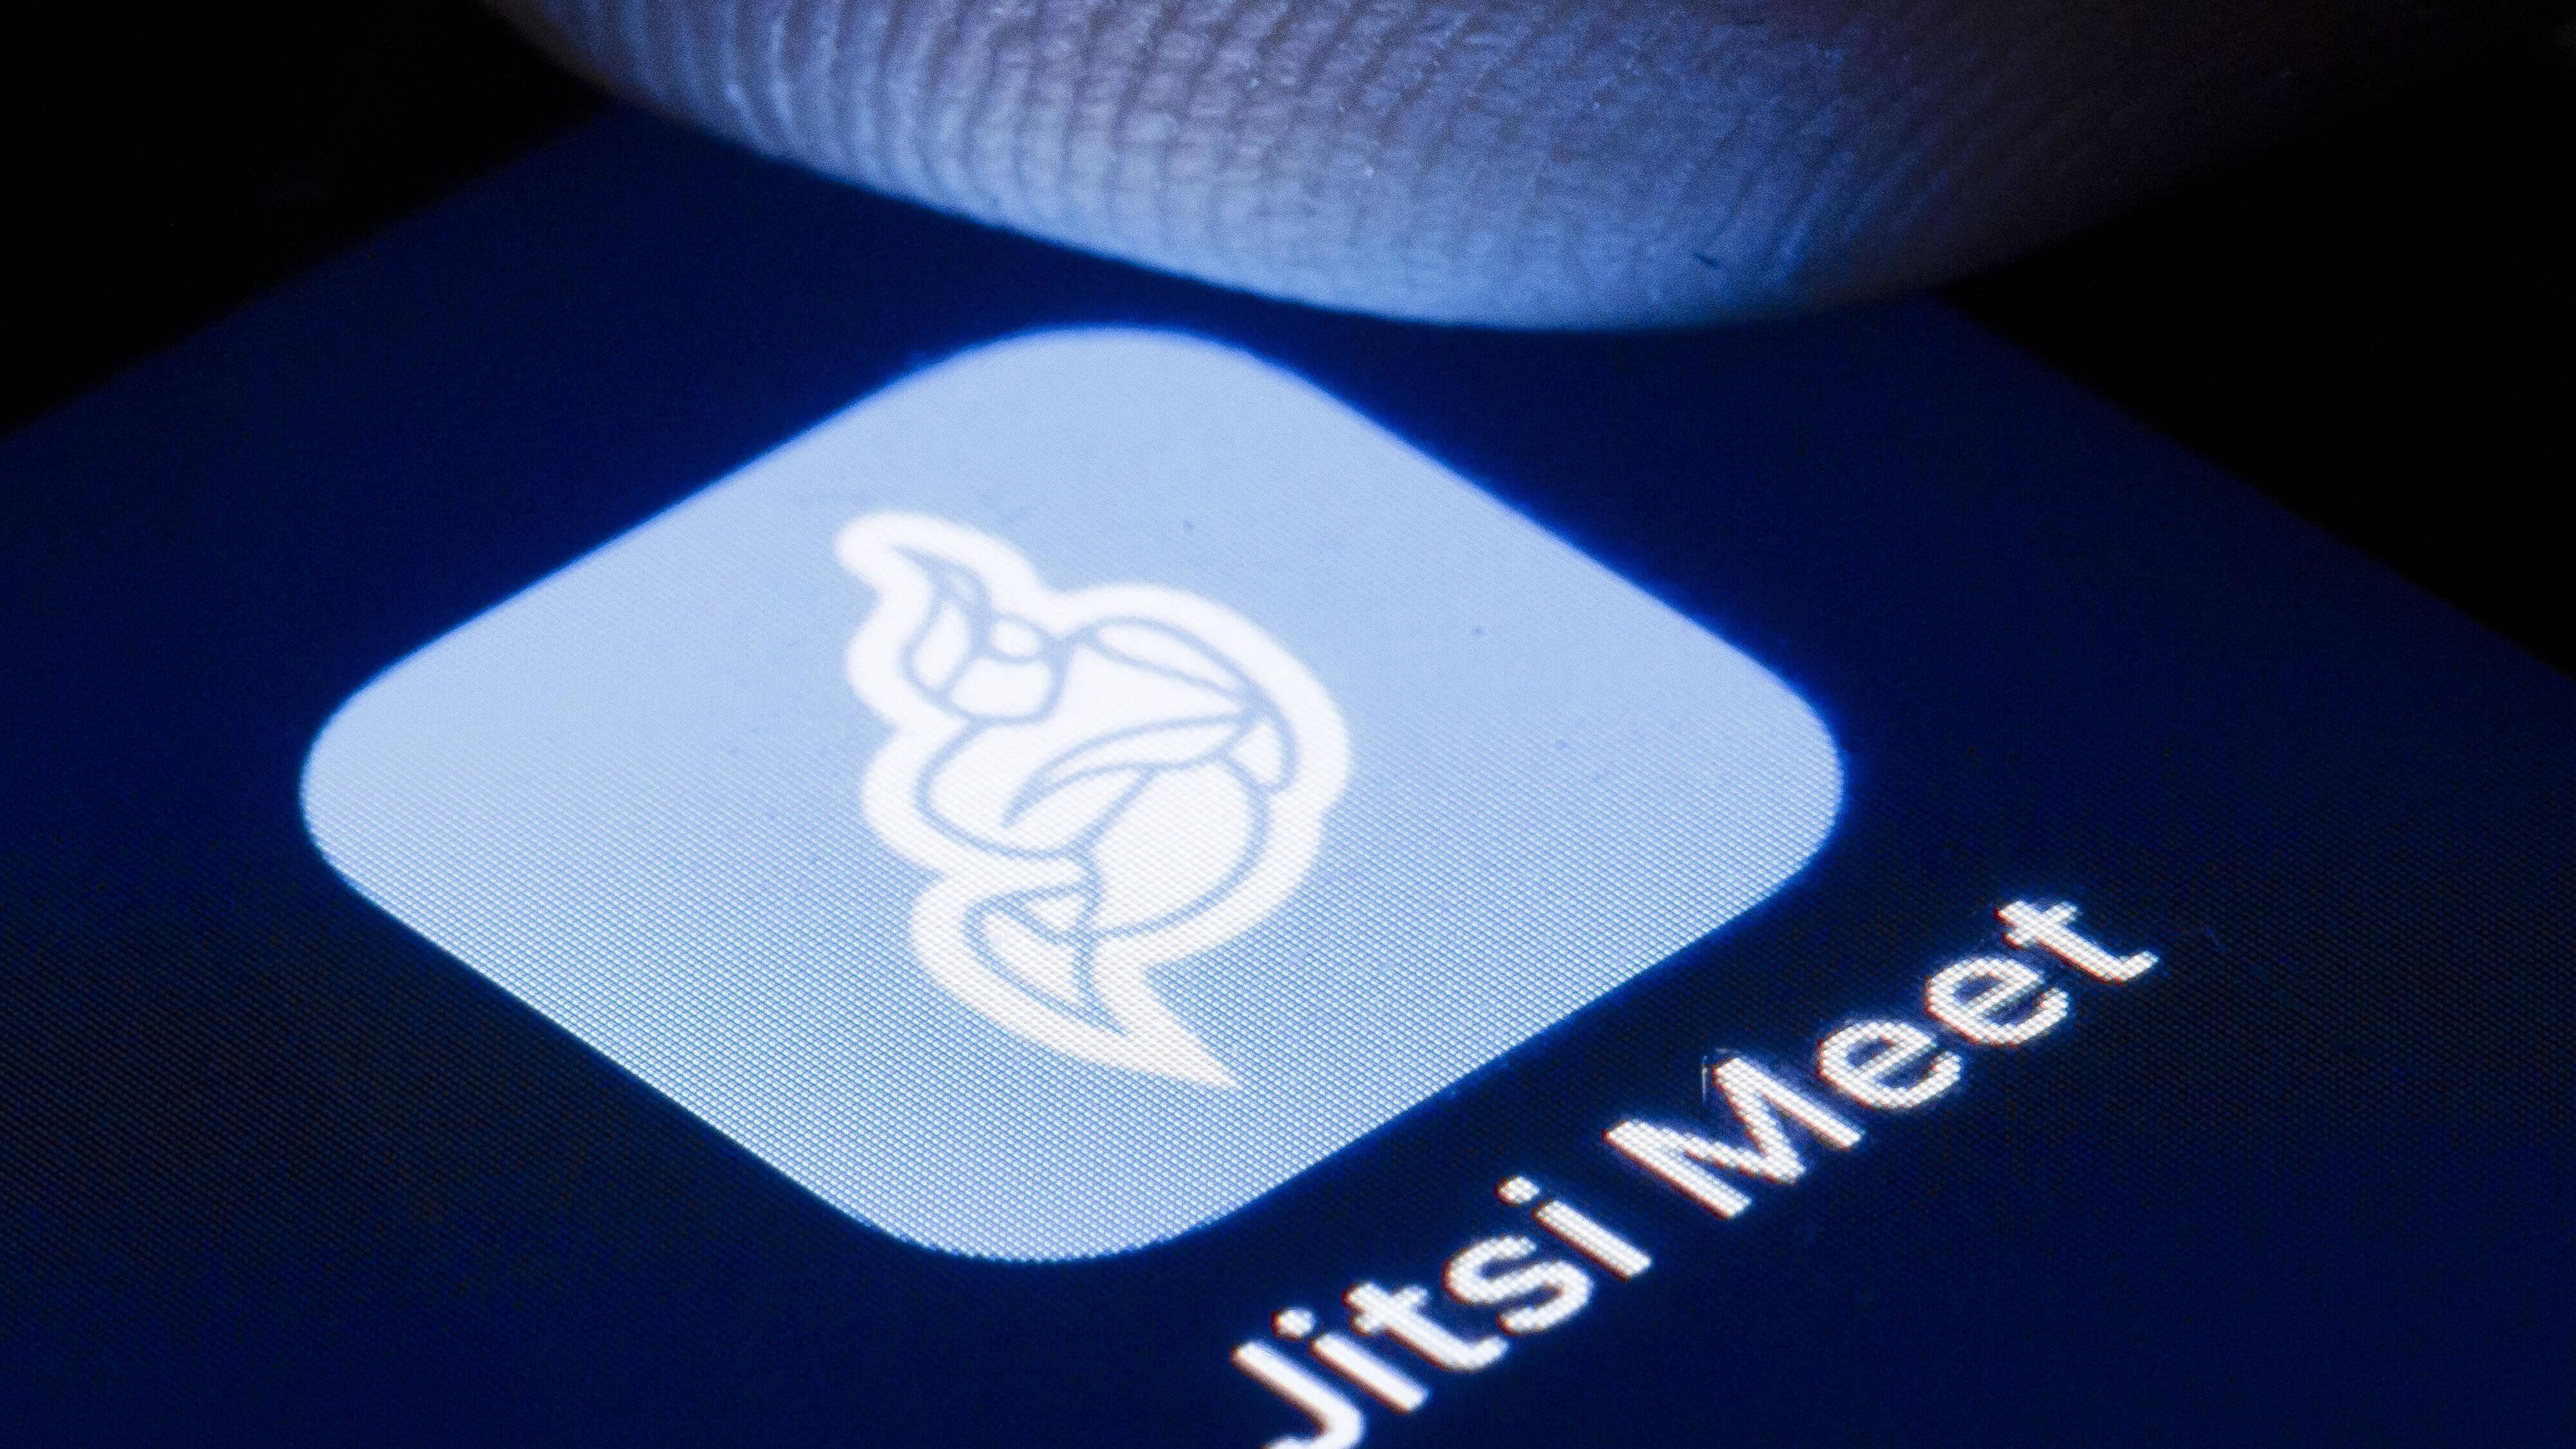 Jitsi Meeting erstellen - so gehts